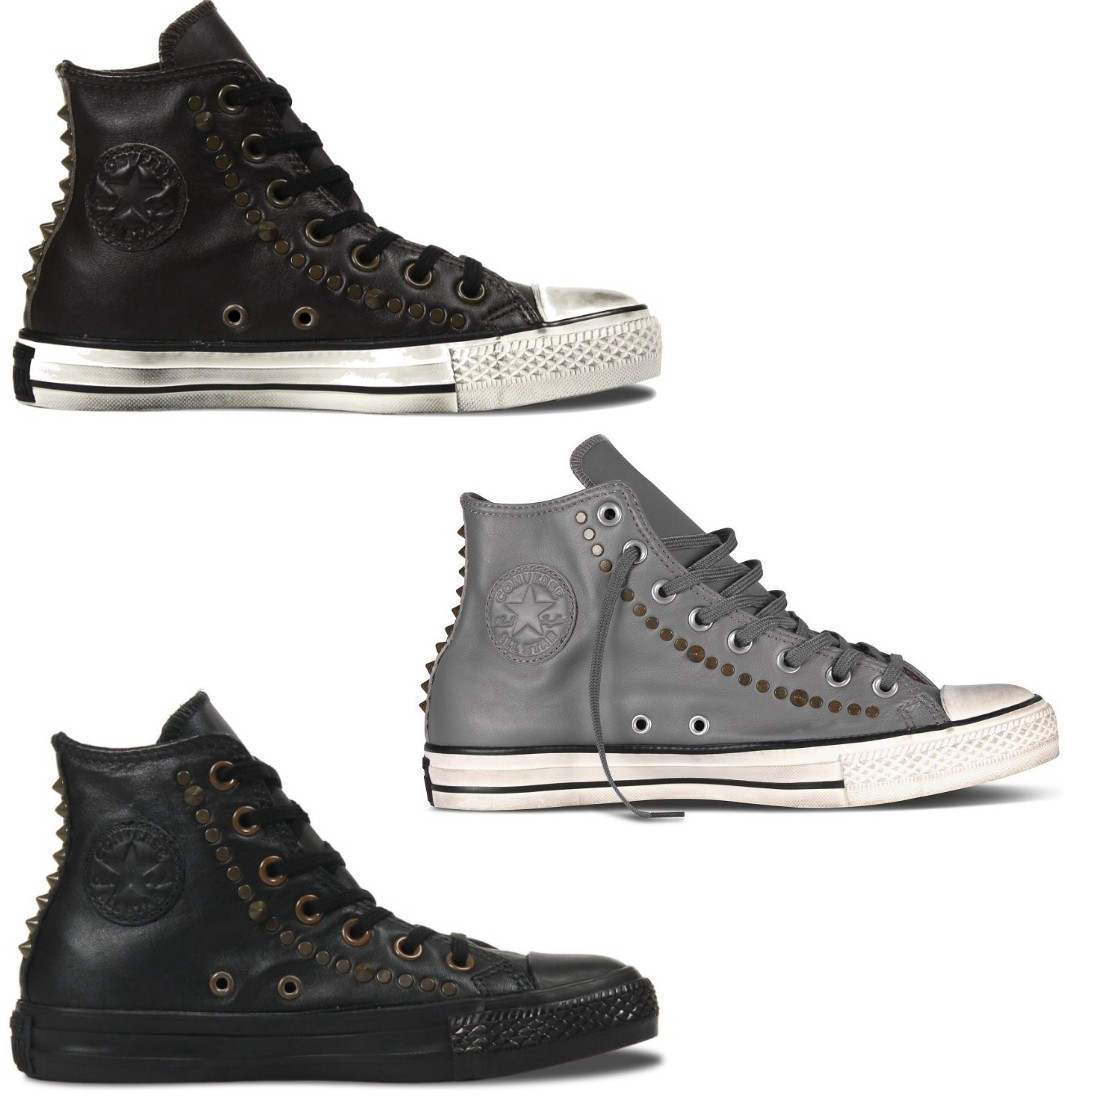 converse chuck taylor all star hi studded schuhe high top sneaker damen herren. Black Bedroom Furniture Sets. Home Design Ideas